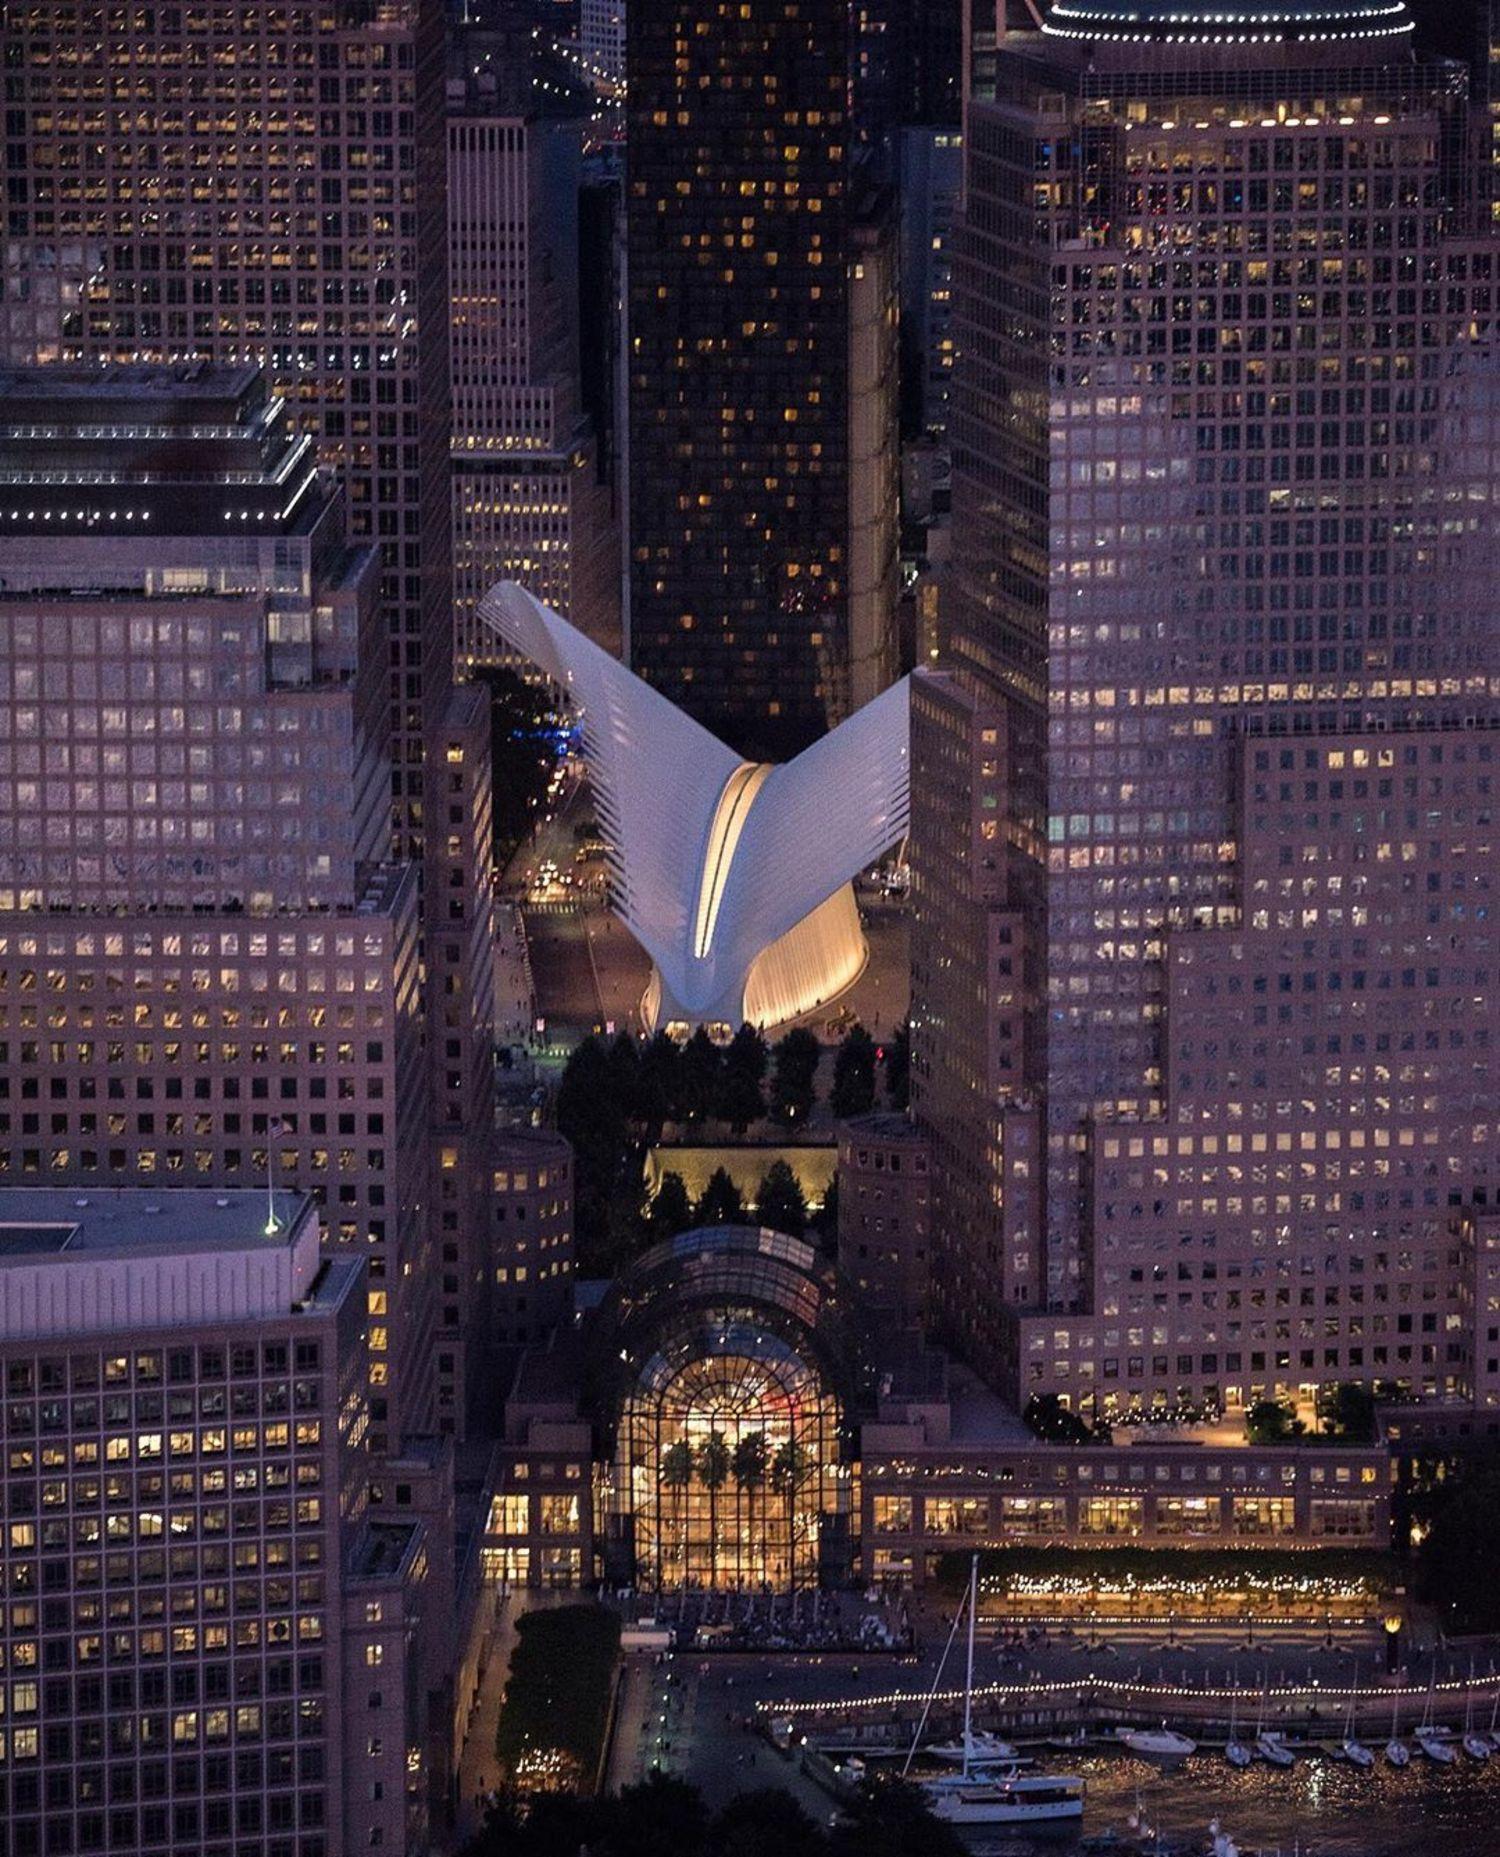 World Trade Center Oculus, Lower Manhattan